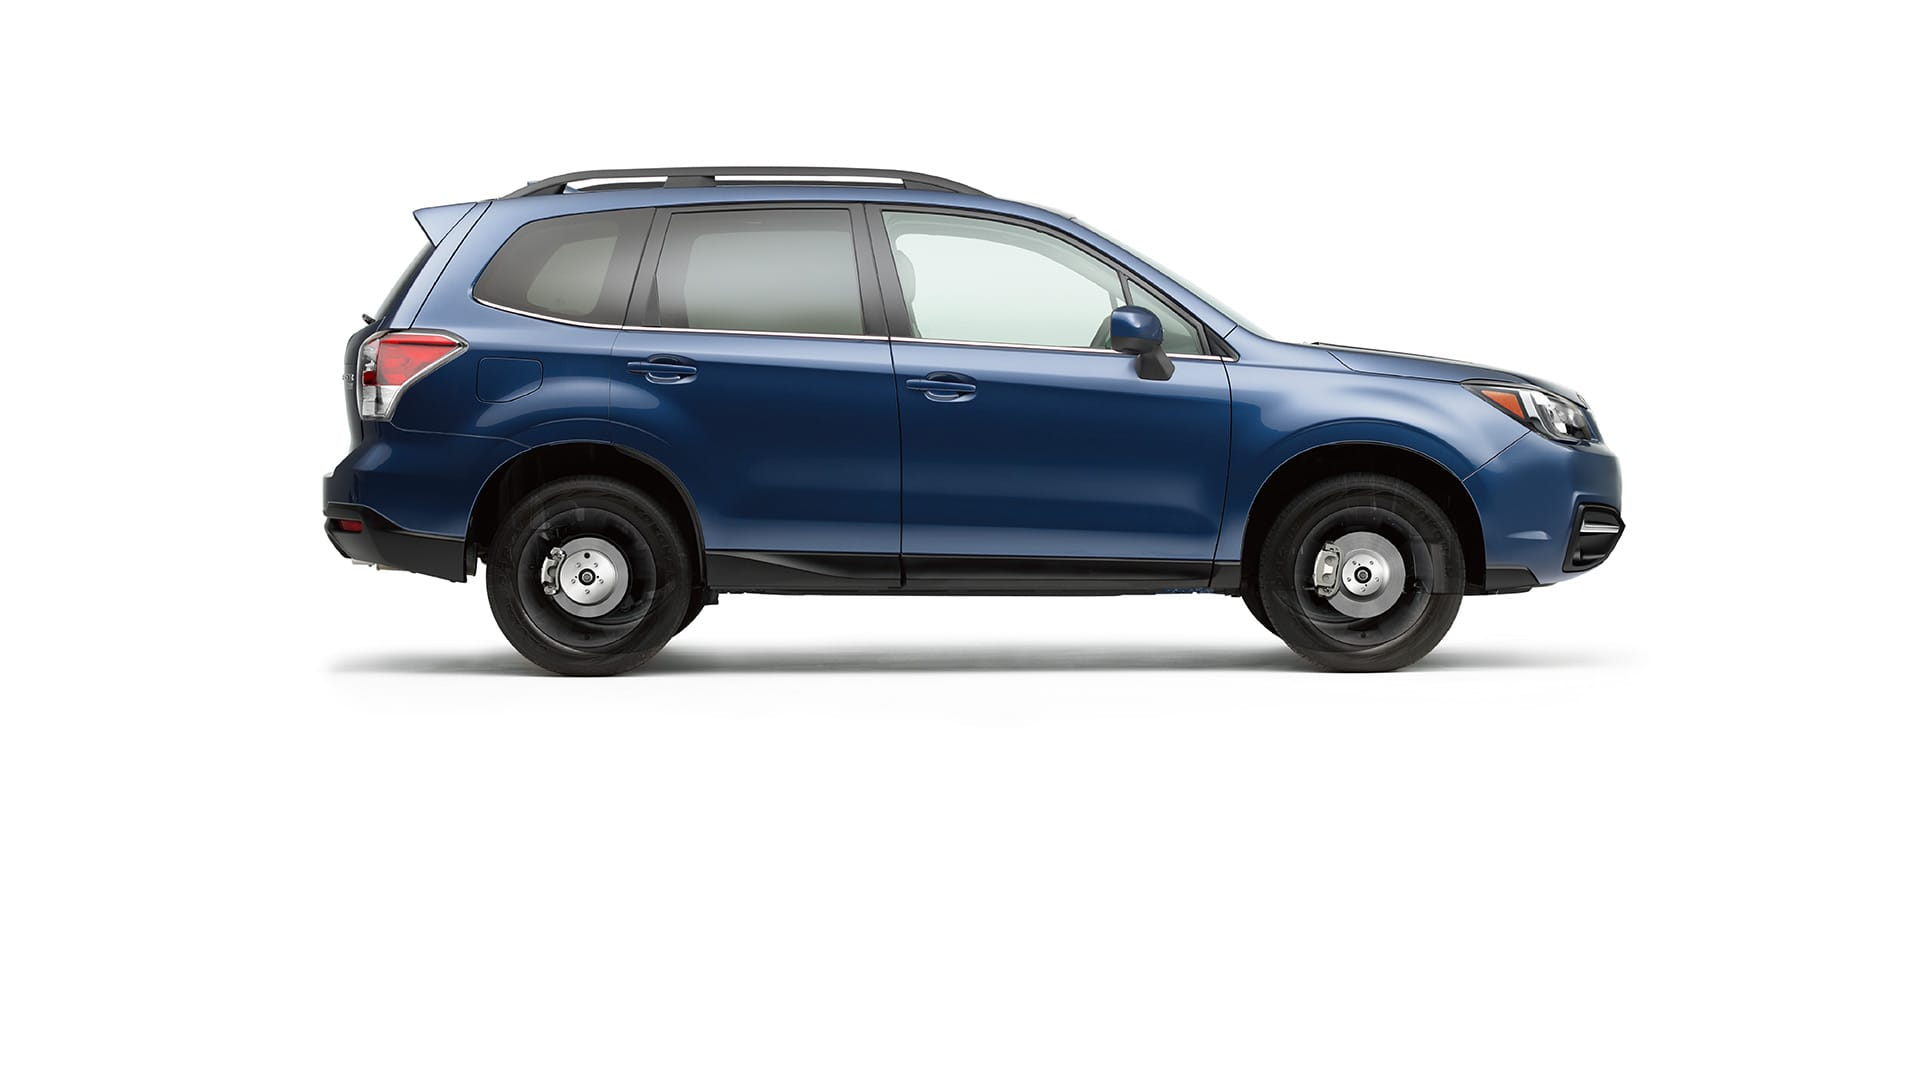 Subaru Rear Vision Camera and Airbags   Subaru Safety Features